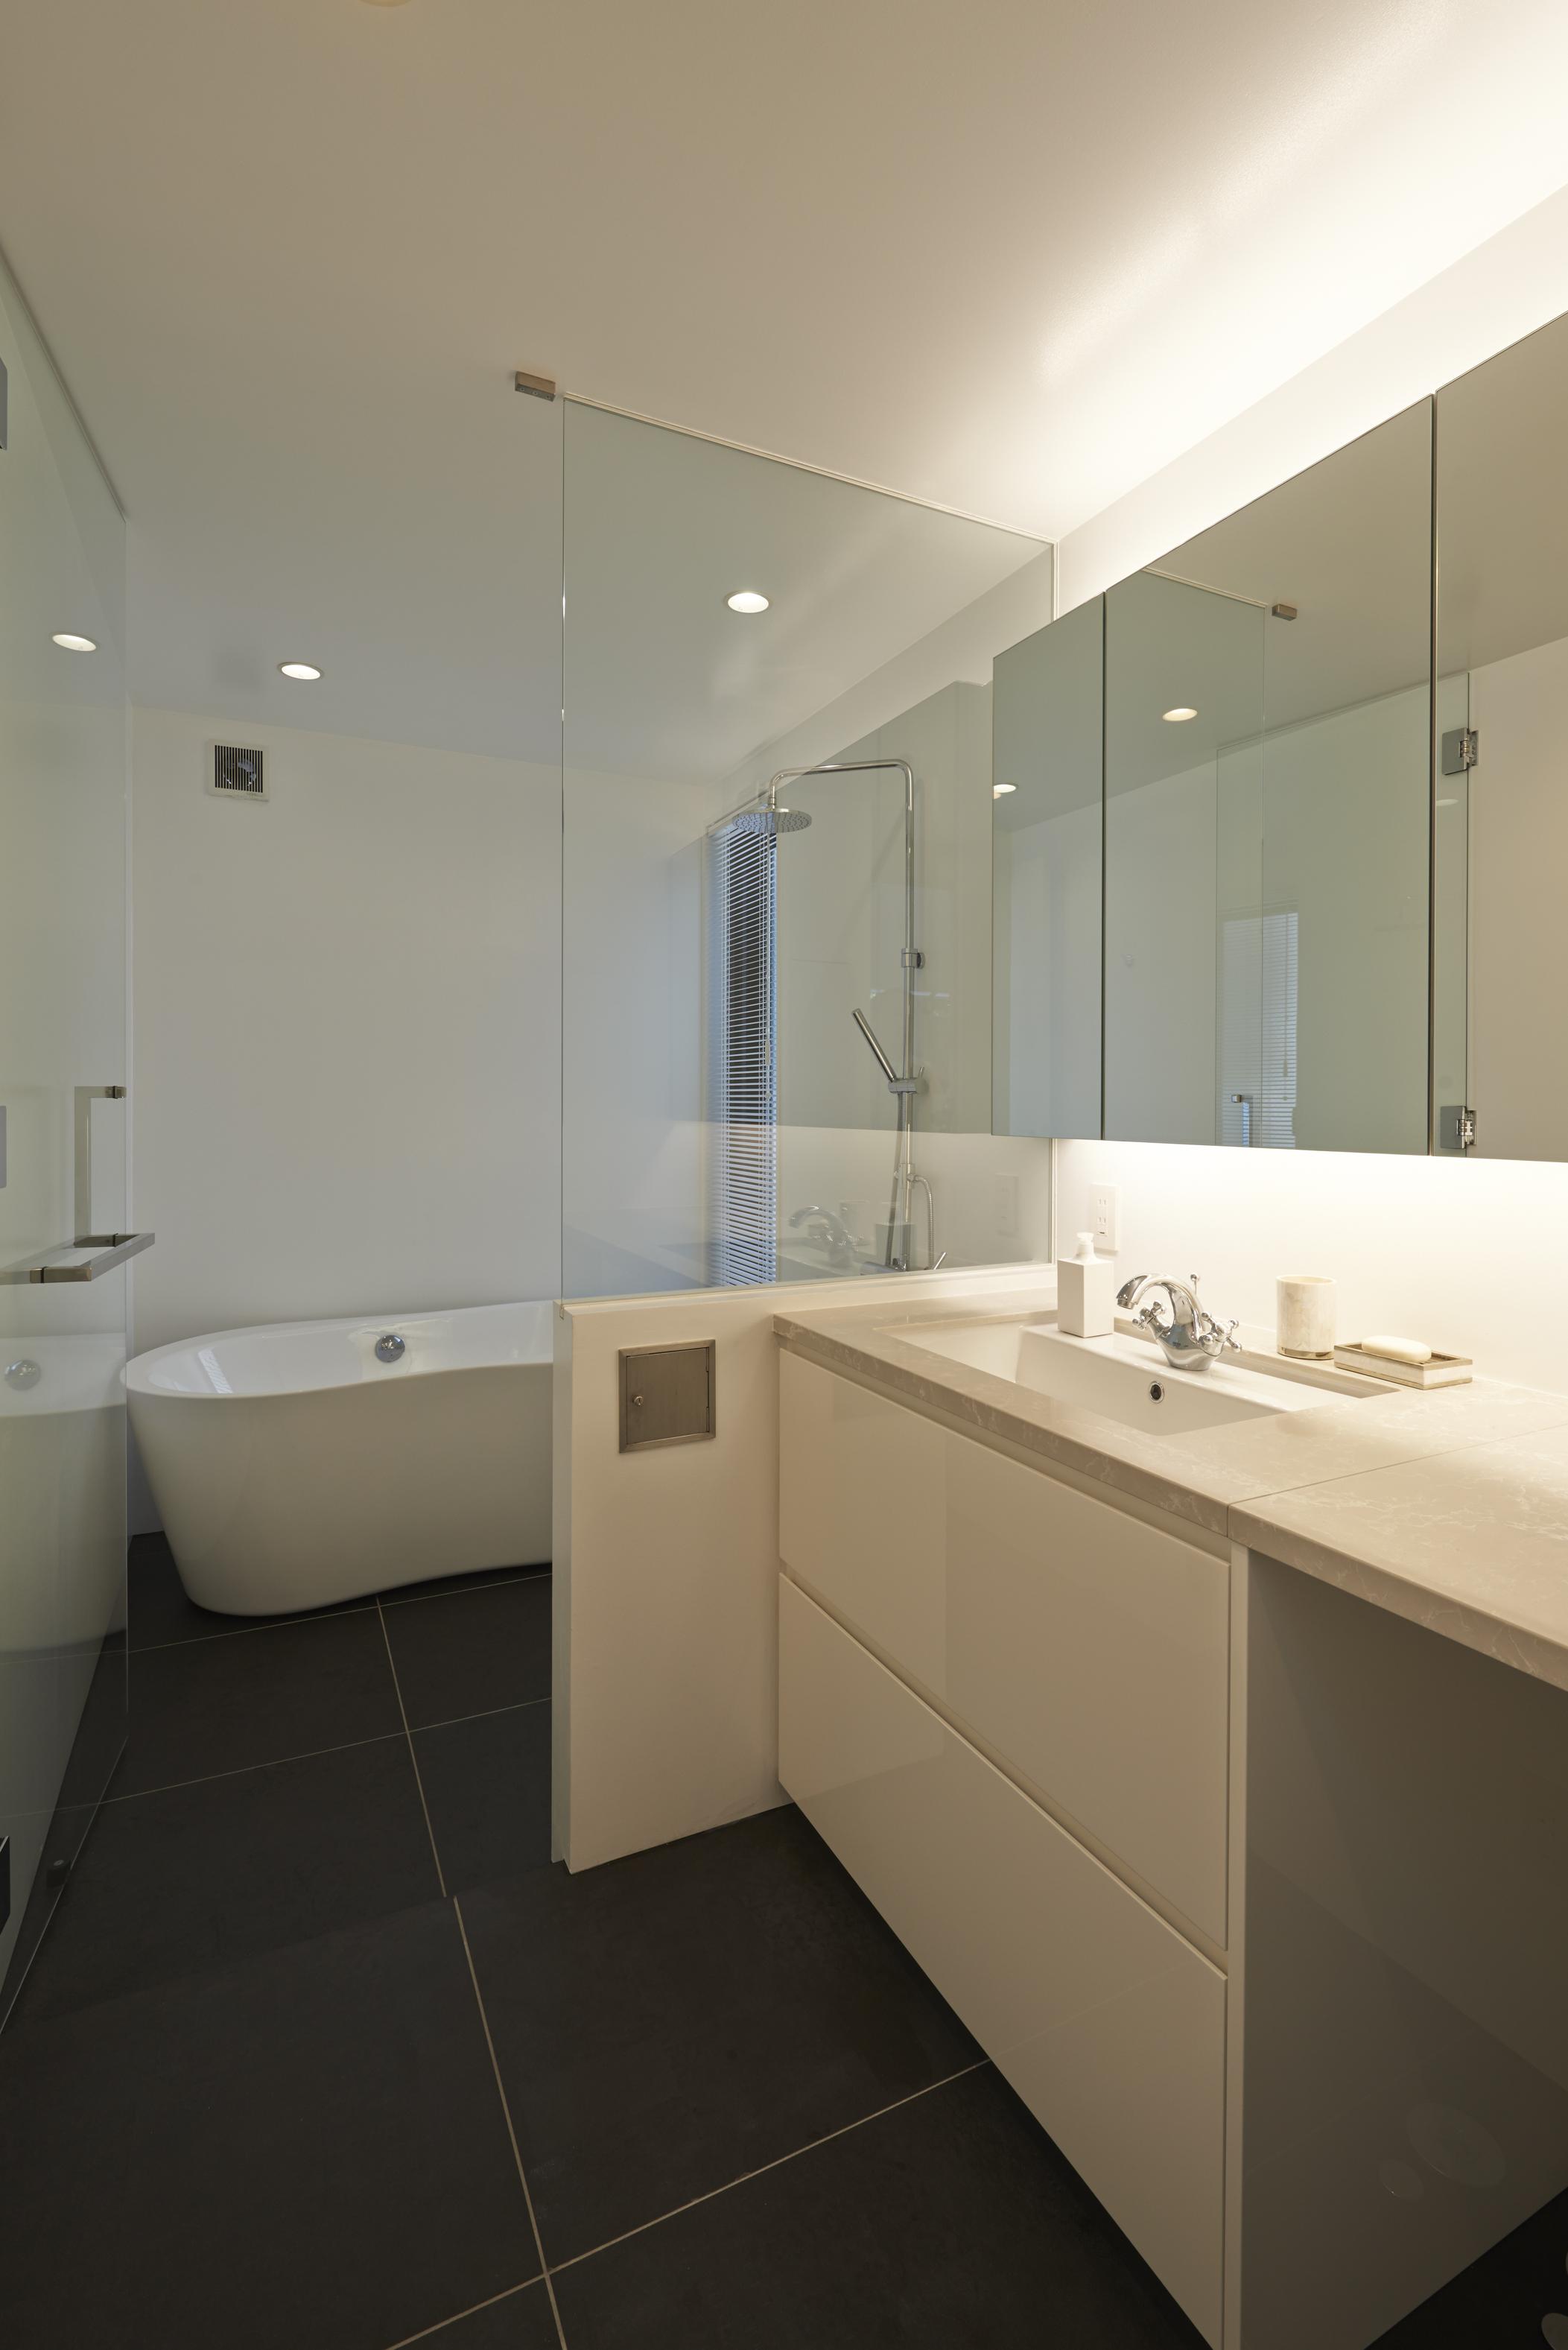 【ARK HOUSE モデルハウス】15坪弱の狭小地にRC造3階建の挑戦